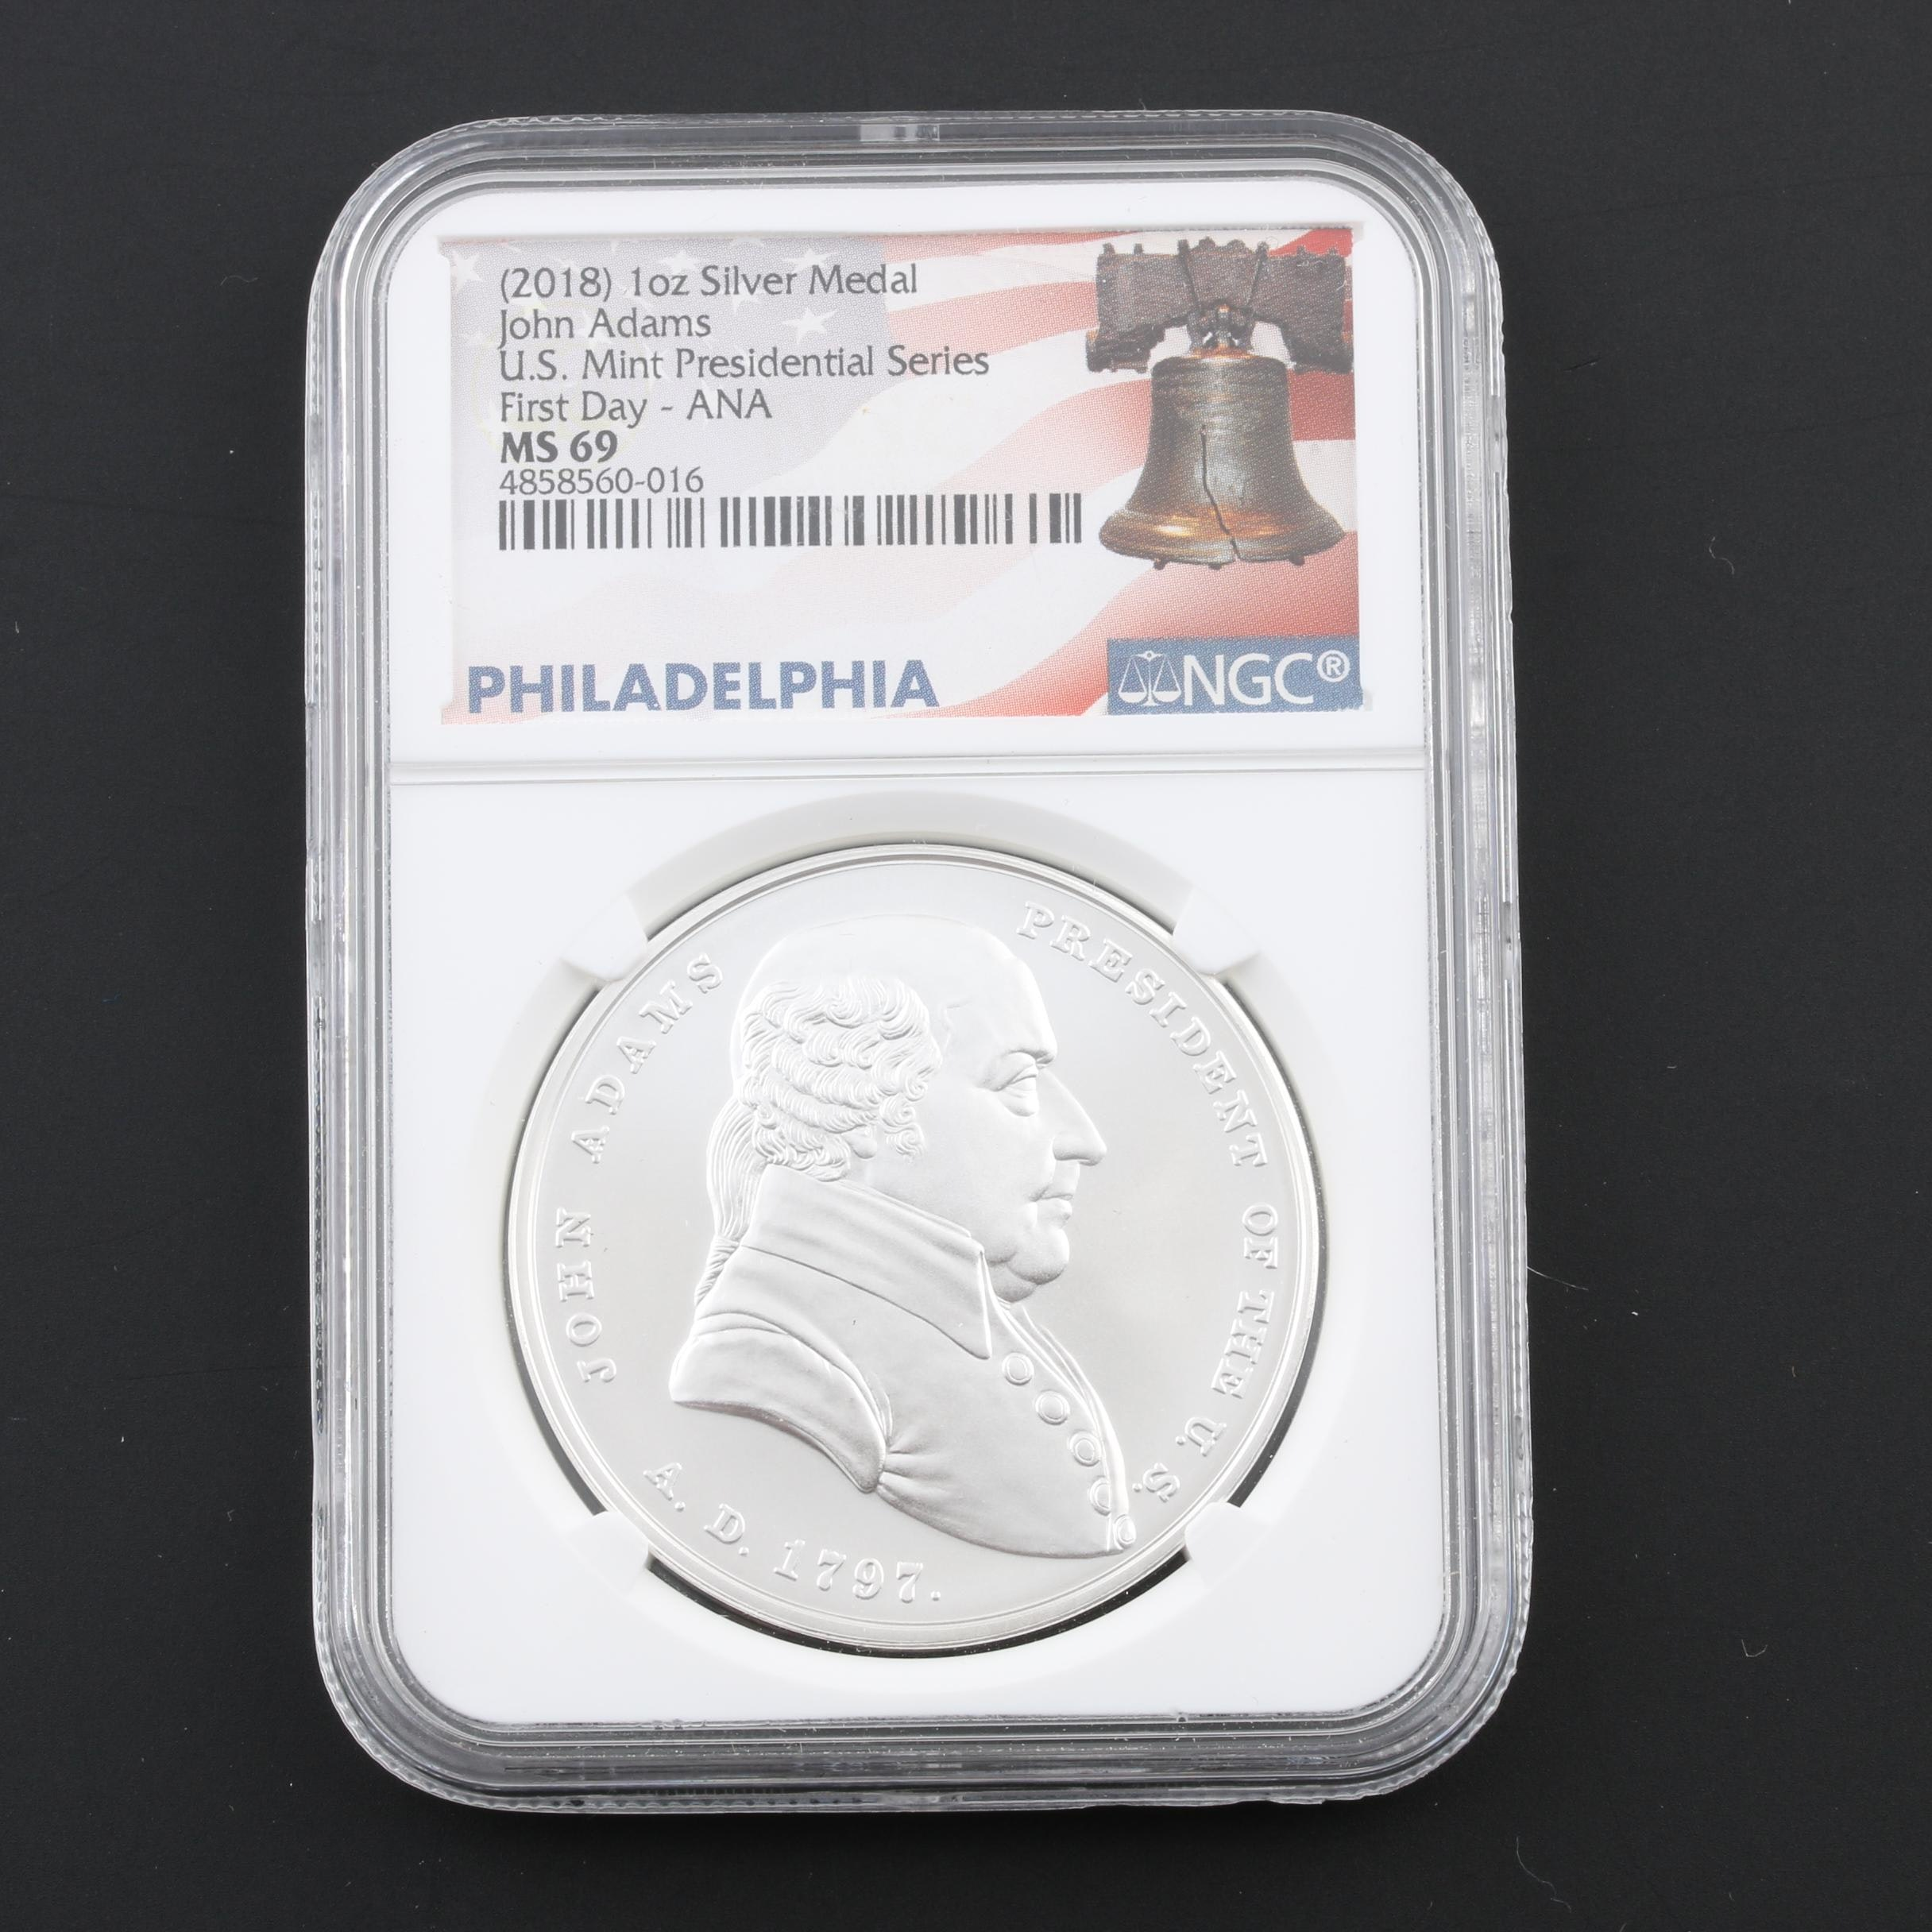 NGC Graded MS69 2018 Presidential Series John Adams Silver Medal